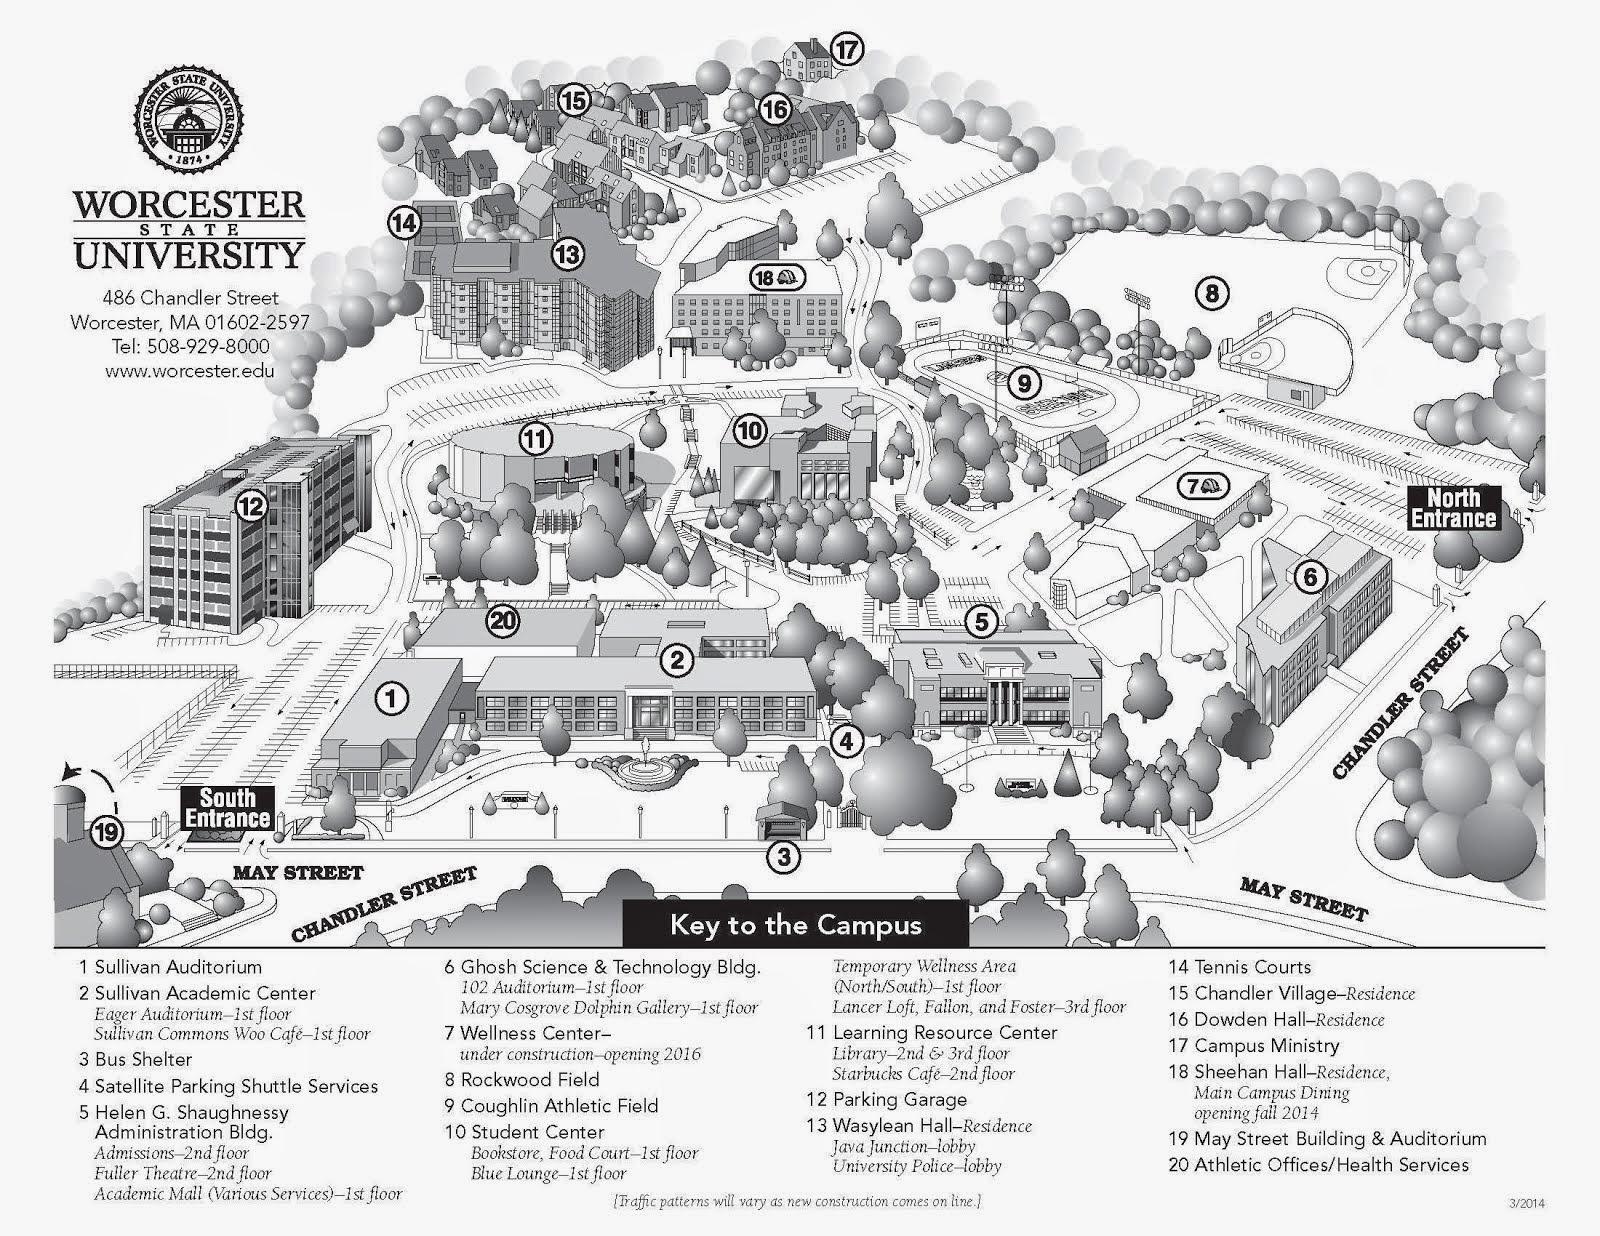 worcester university campus map Massachusetts Association Of Student Councils 2014 worcester university campus map